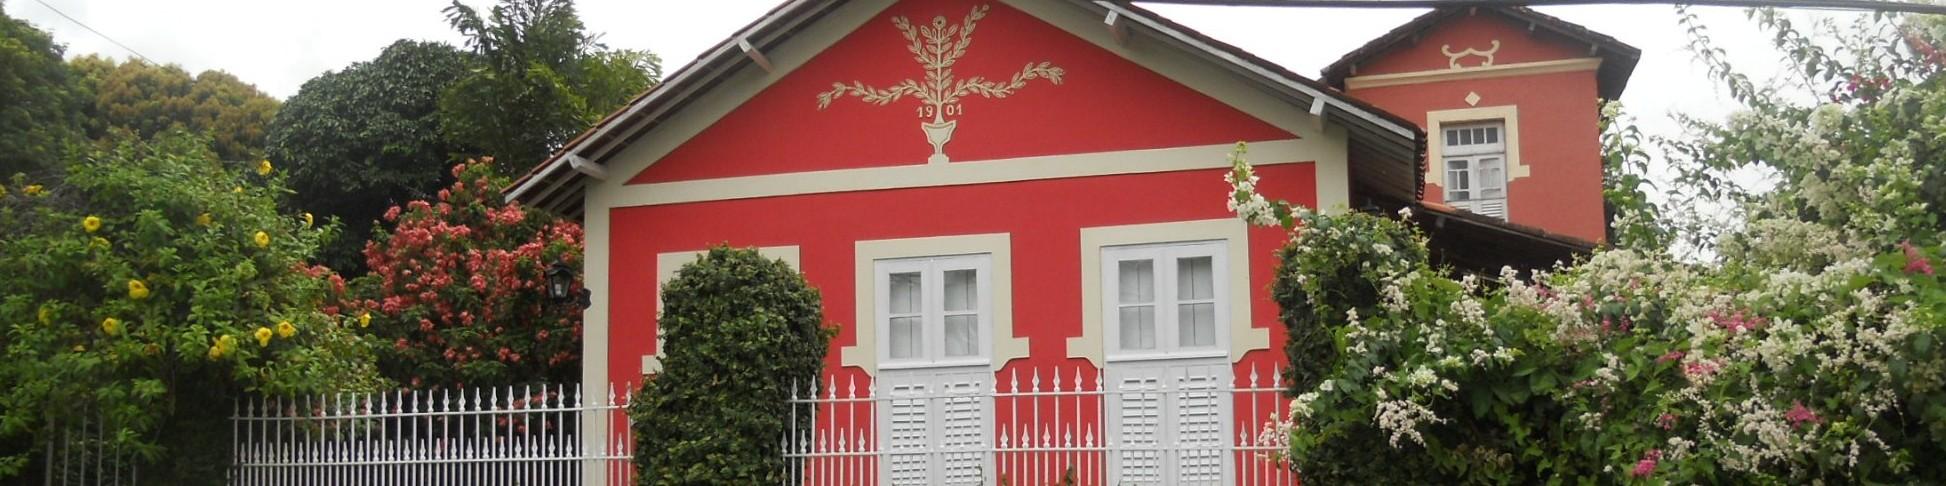 Casa de 1901